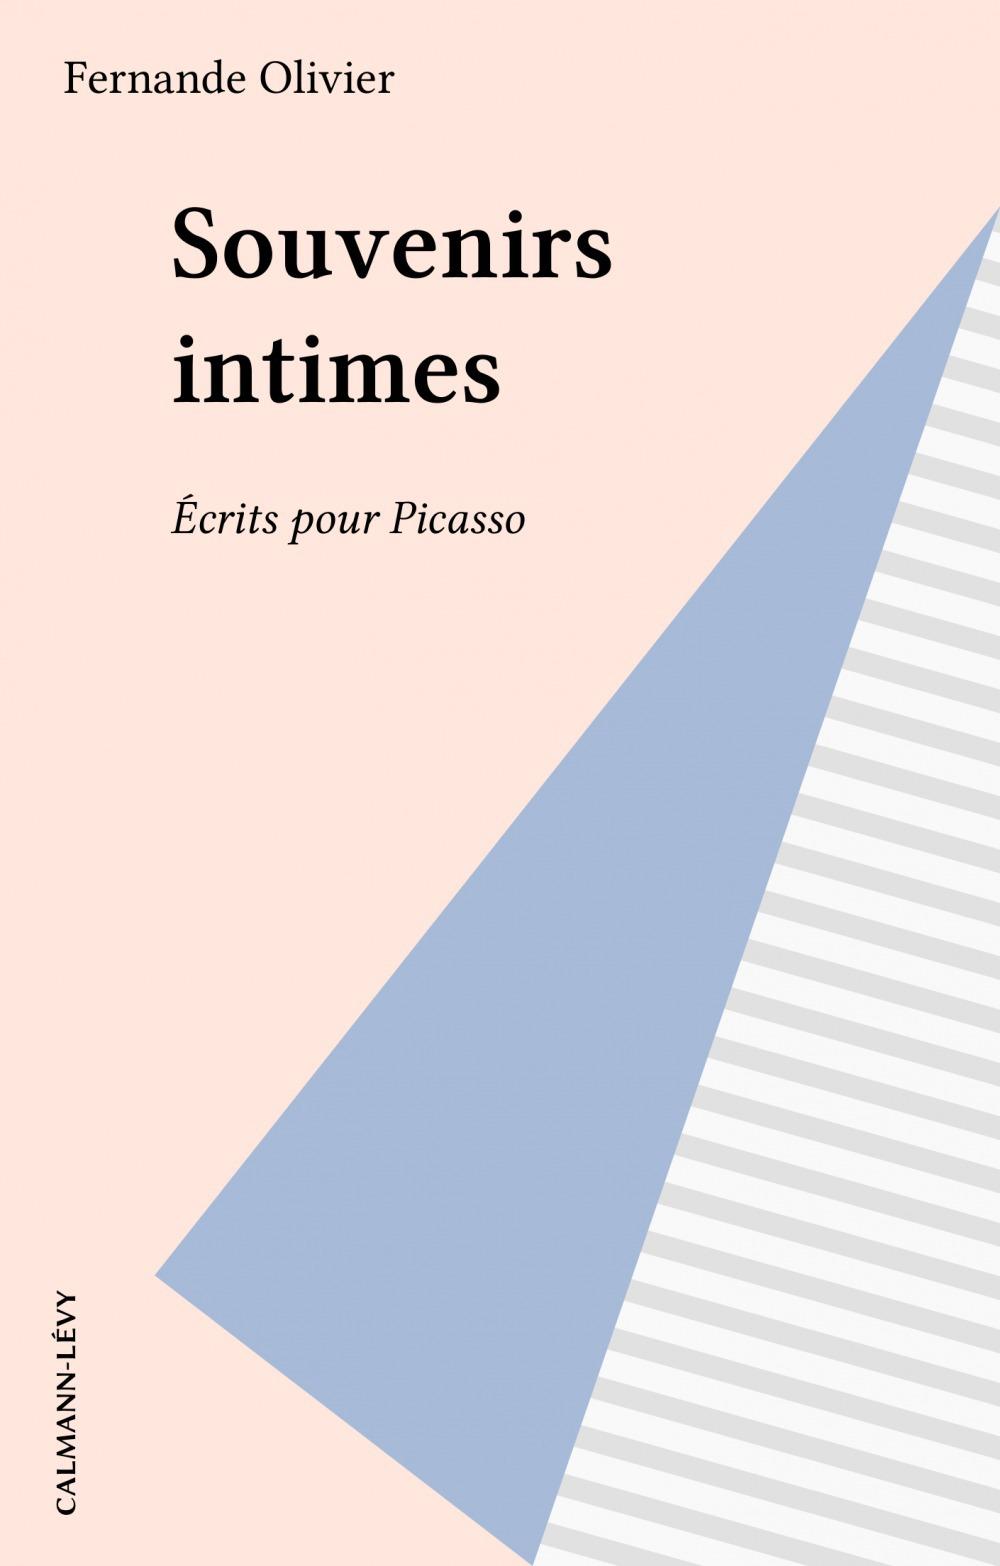 Souvenirs intimes  - Fernande Olivier